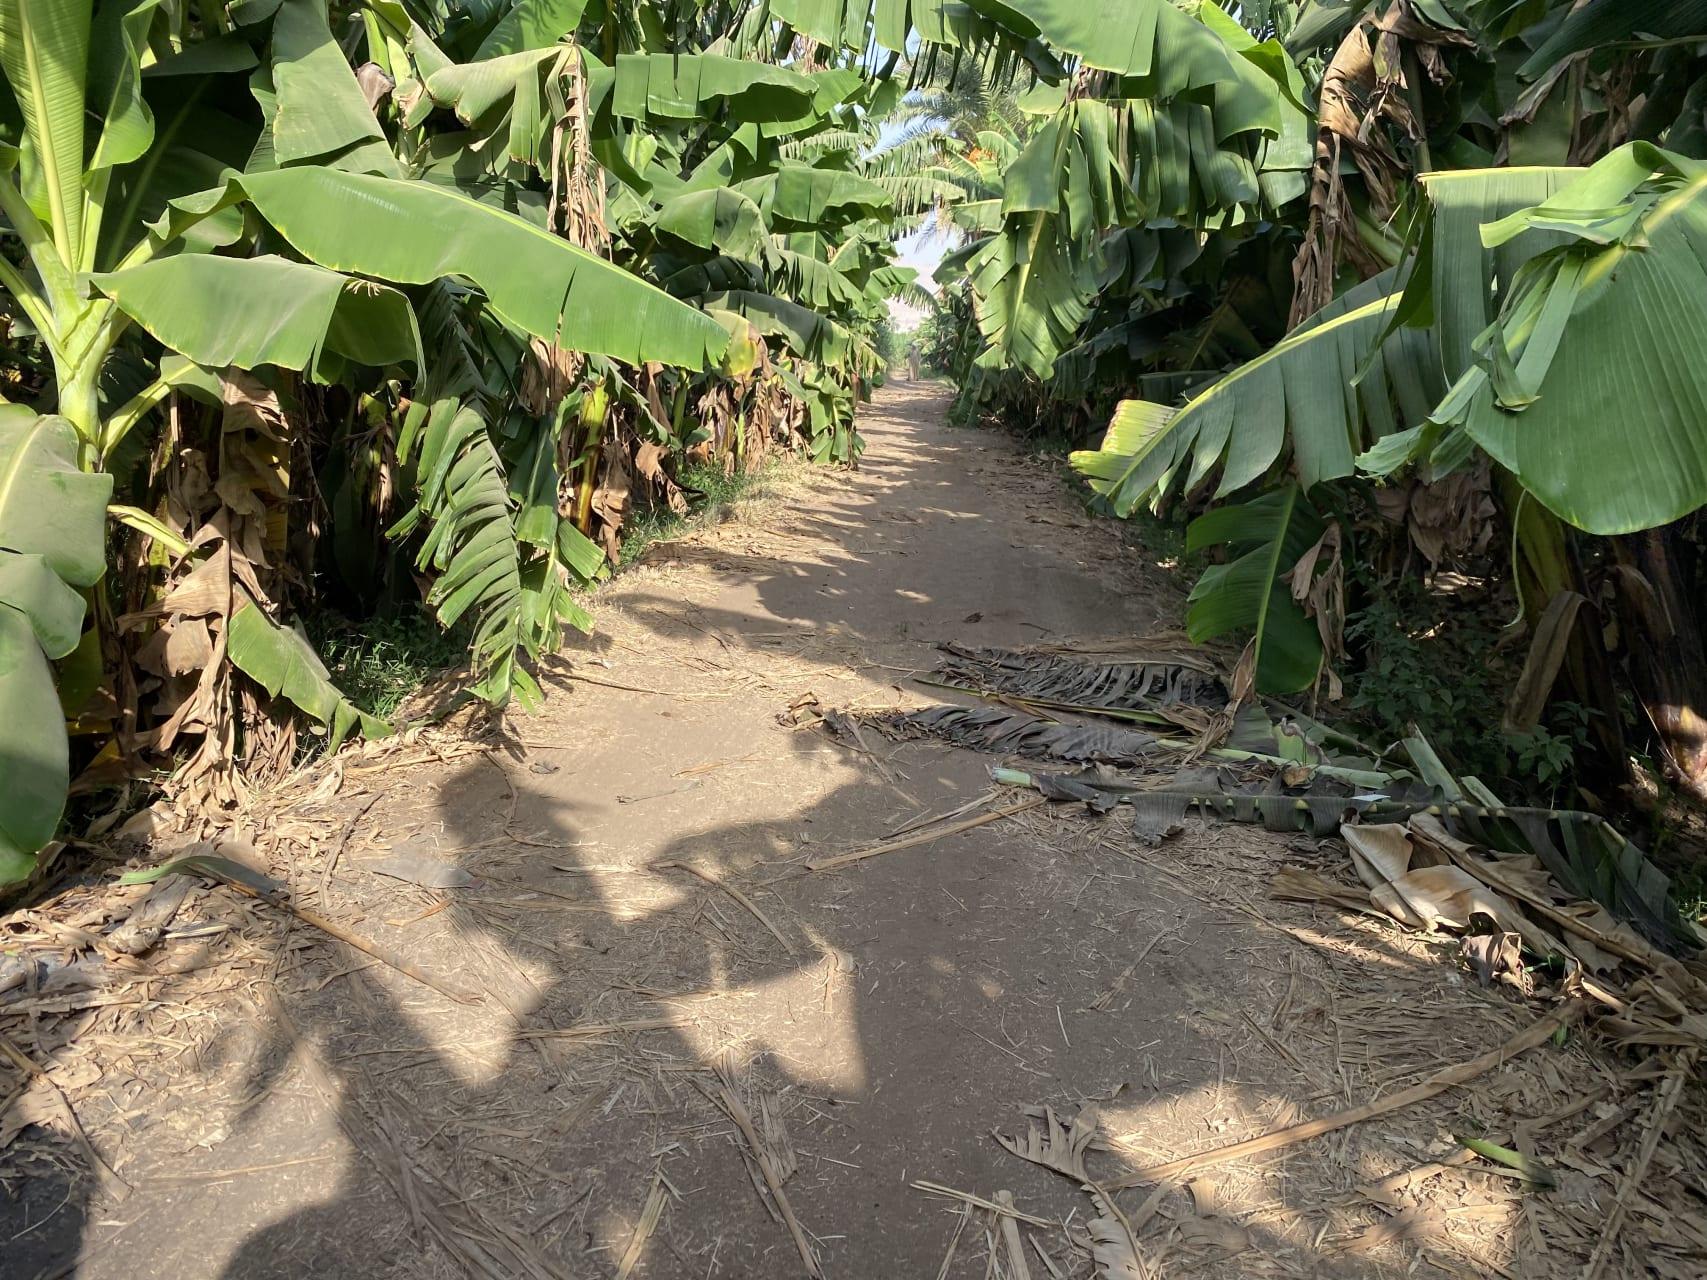 Luxor - A Walk Amongst The Bananas